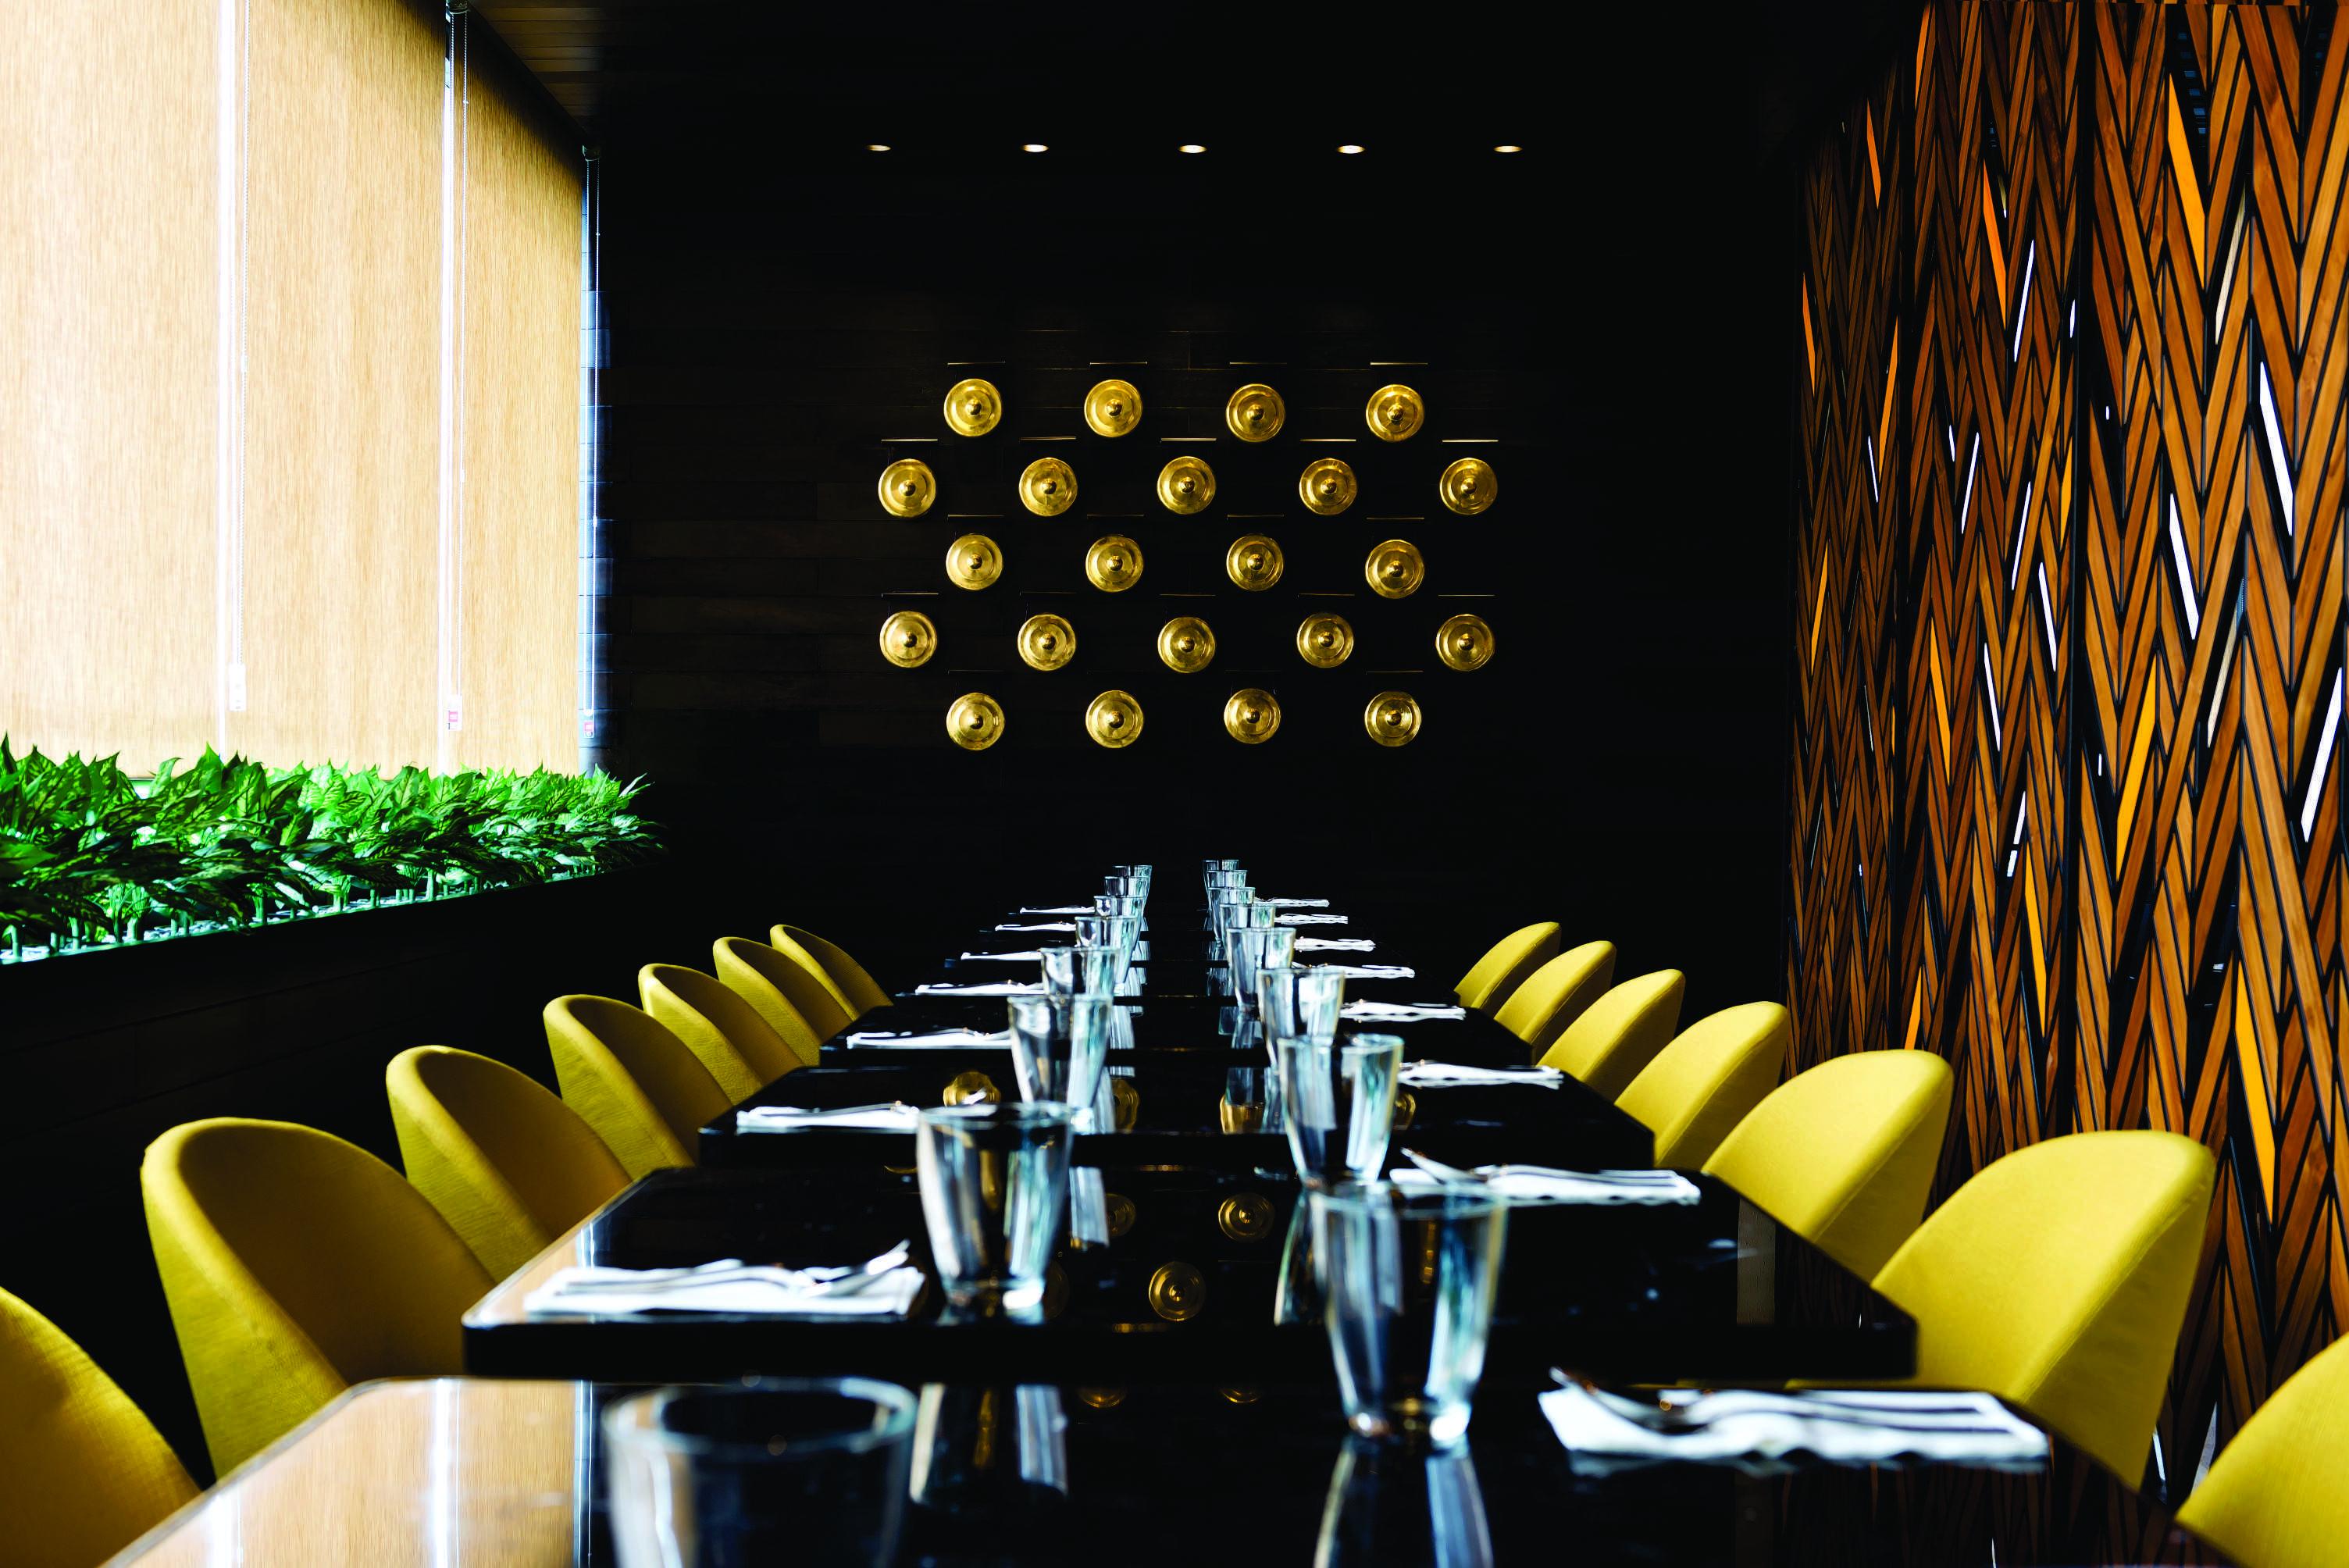 Mint-Ds Kilakila Restaurant Scbd, Jakarta Scbd, Jakarta Dining Area   16197